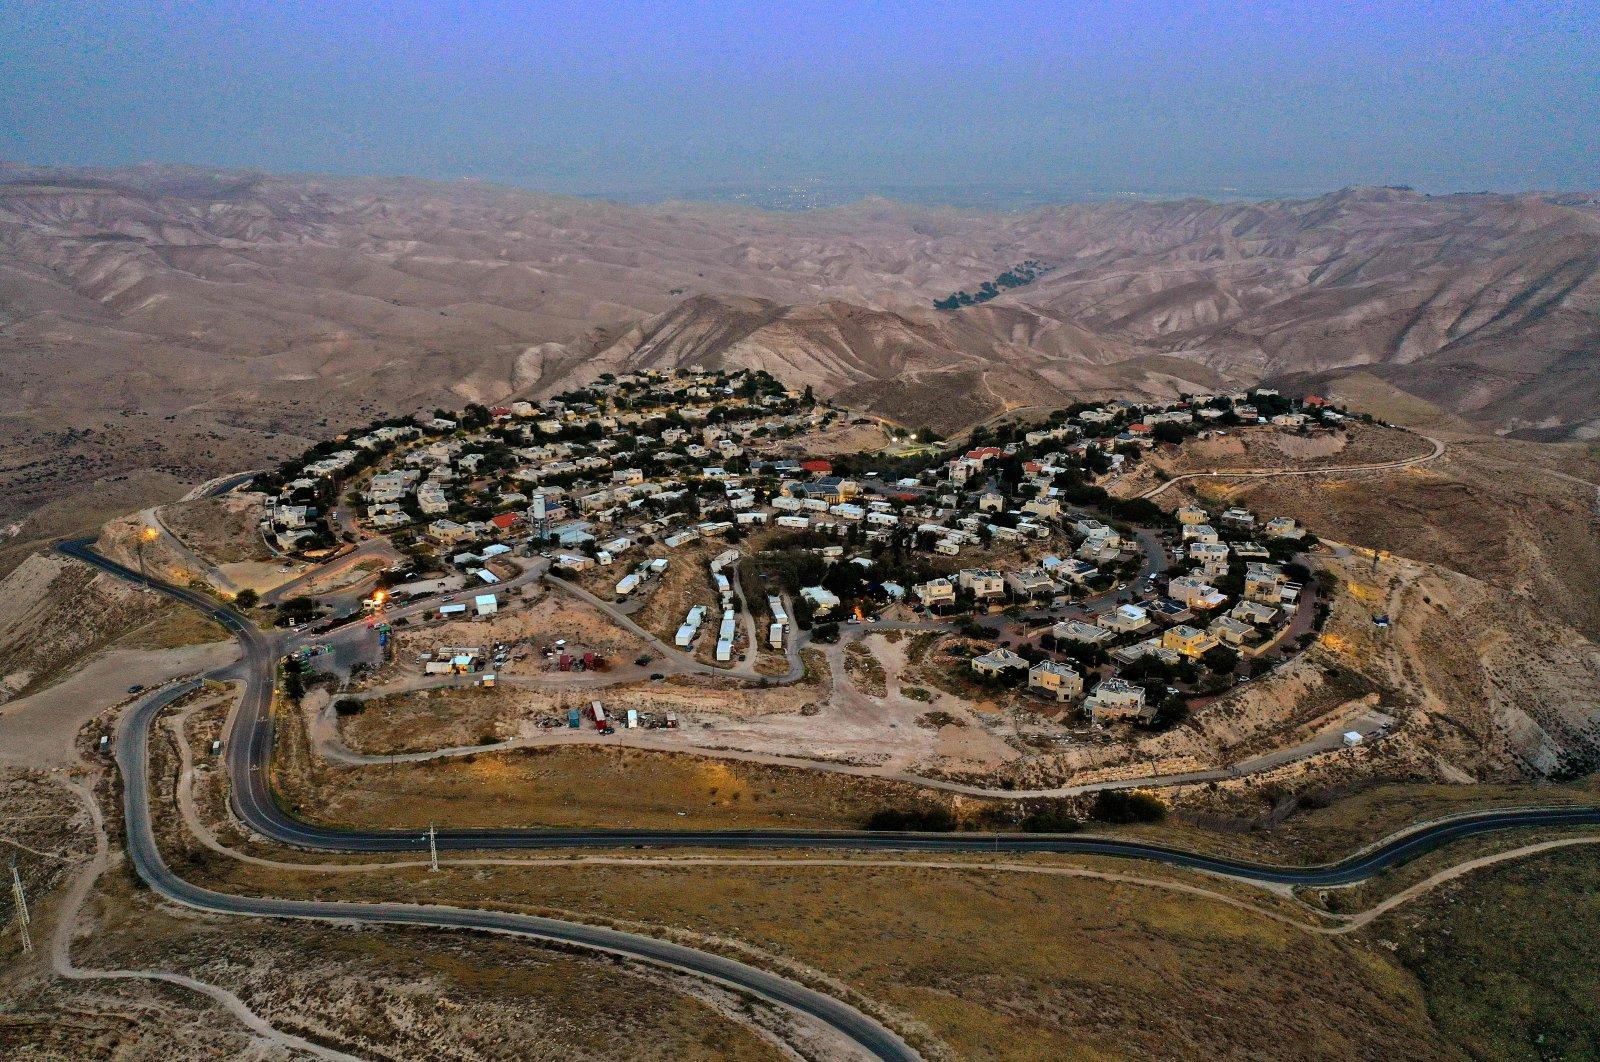 The illegal Israeli settlement of Alon in the Judaean desert, east of Jerusalem in the Israeli-occupied West Bank, Dec. 2, 2020. (AFP Photo)